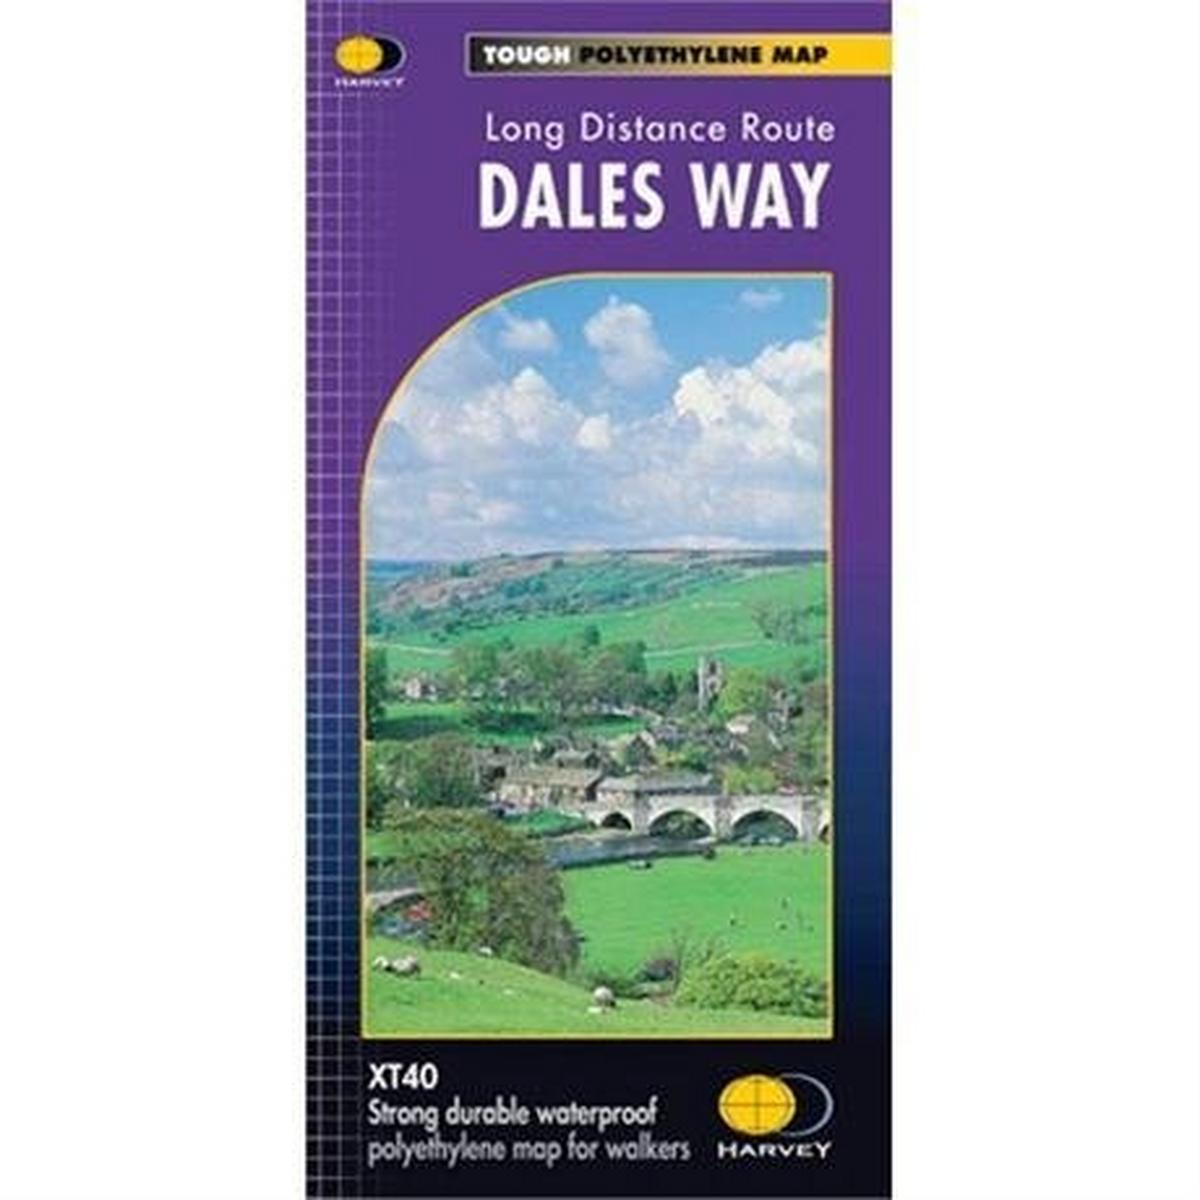 Harveys Harvey Map - XT40: Dales Way